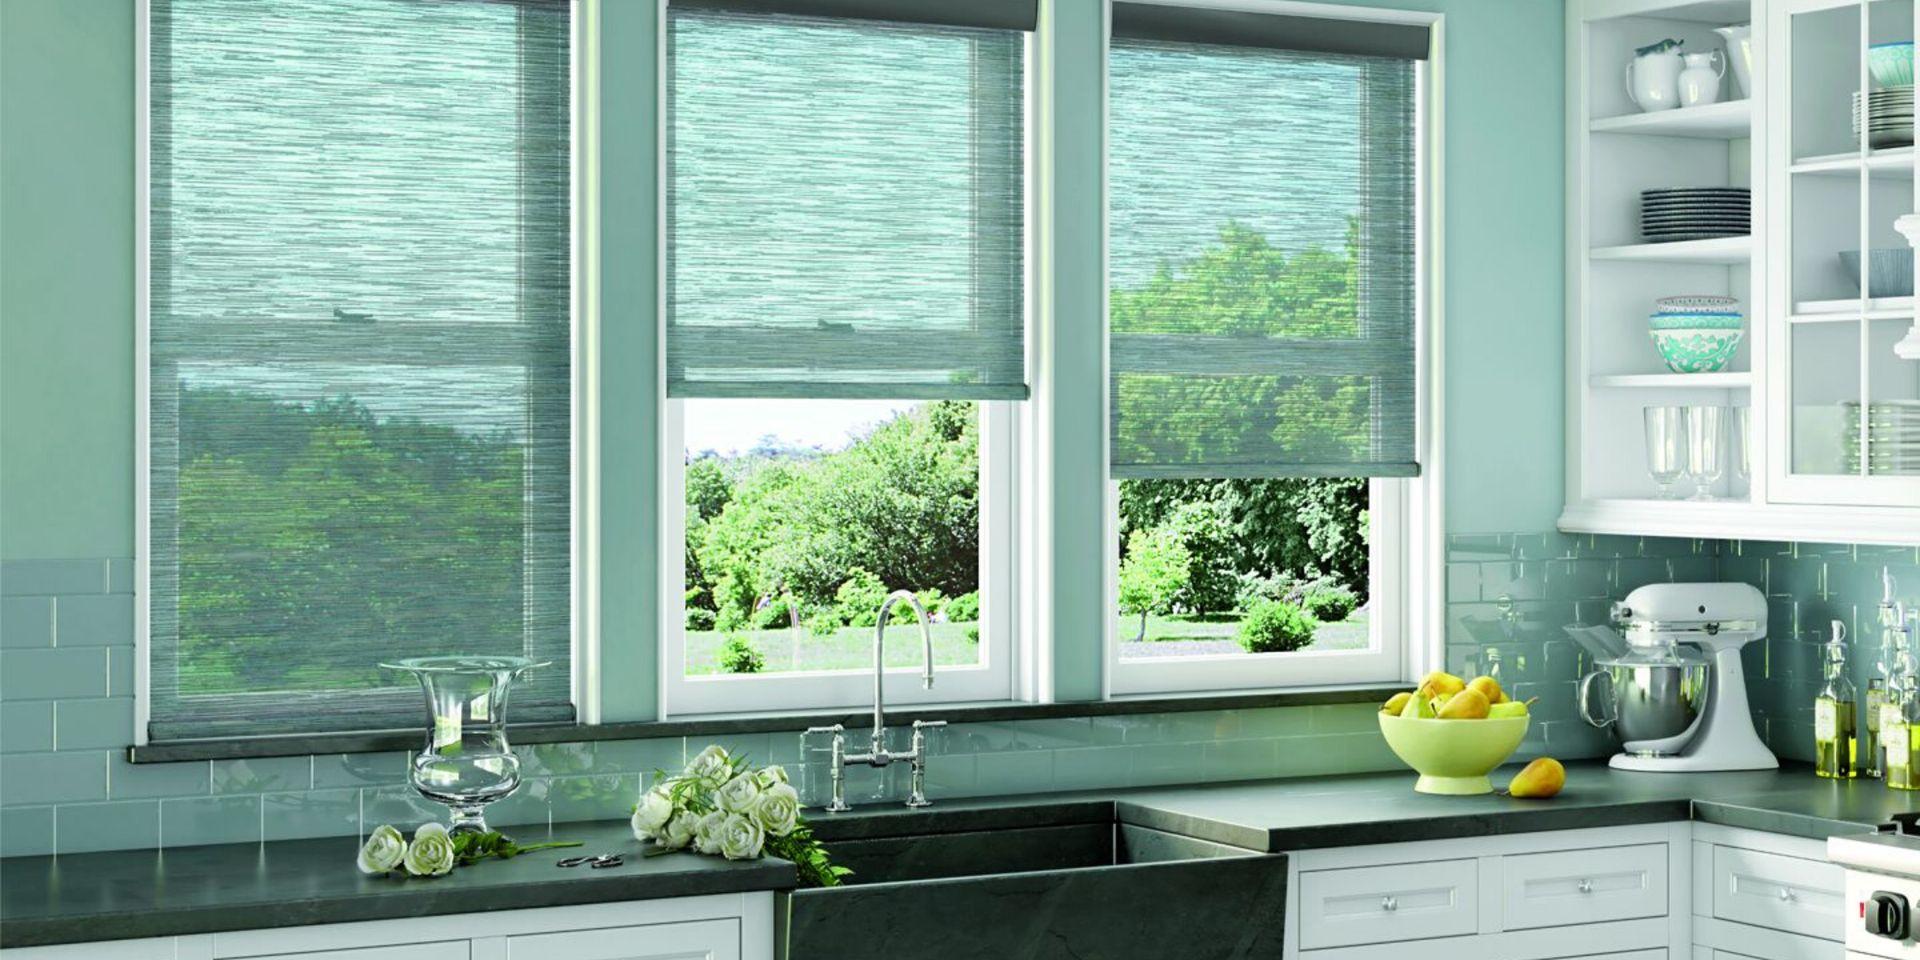 12 Kitchen Window Treatment Ideas for a Fresh Look   Stoneside